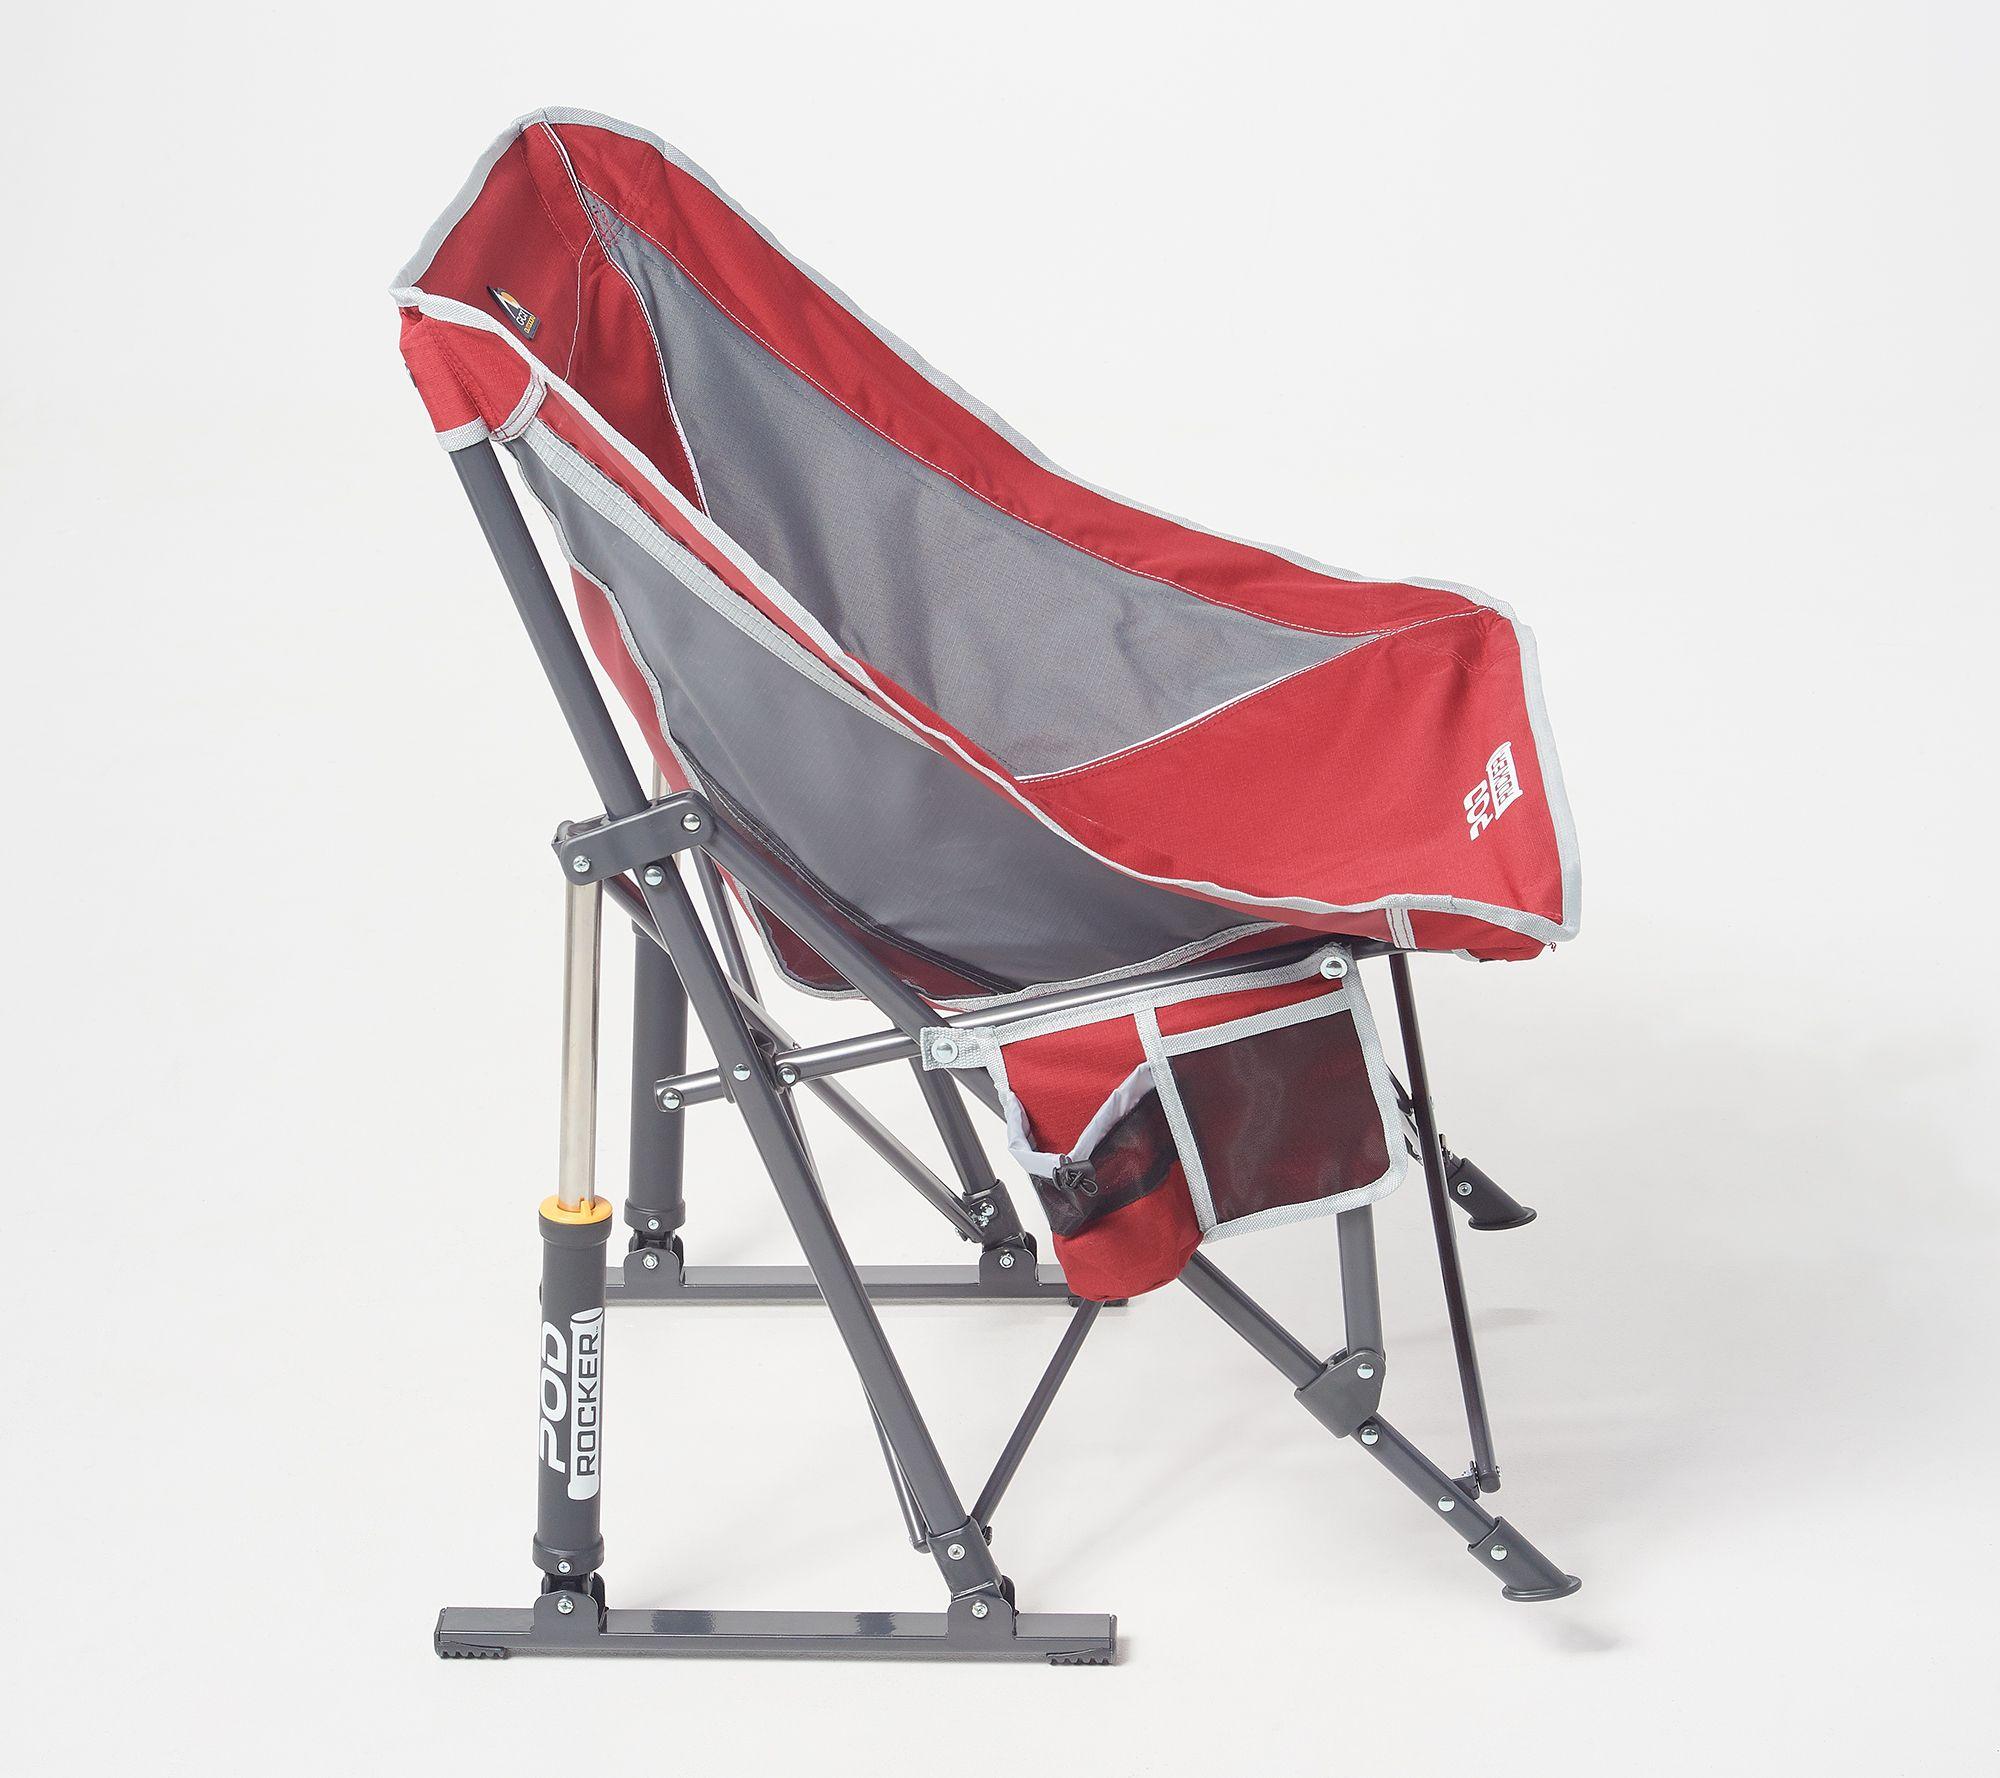 Enjoyable Gci Outdoor Pod Pro Rocker Chair With Carry Bag Qvc Com Short Links Chair Design For Home Short Linksinfo